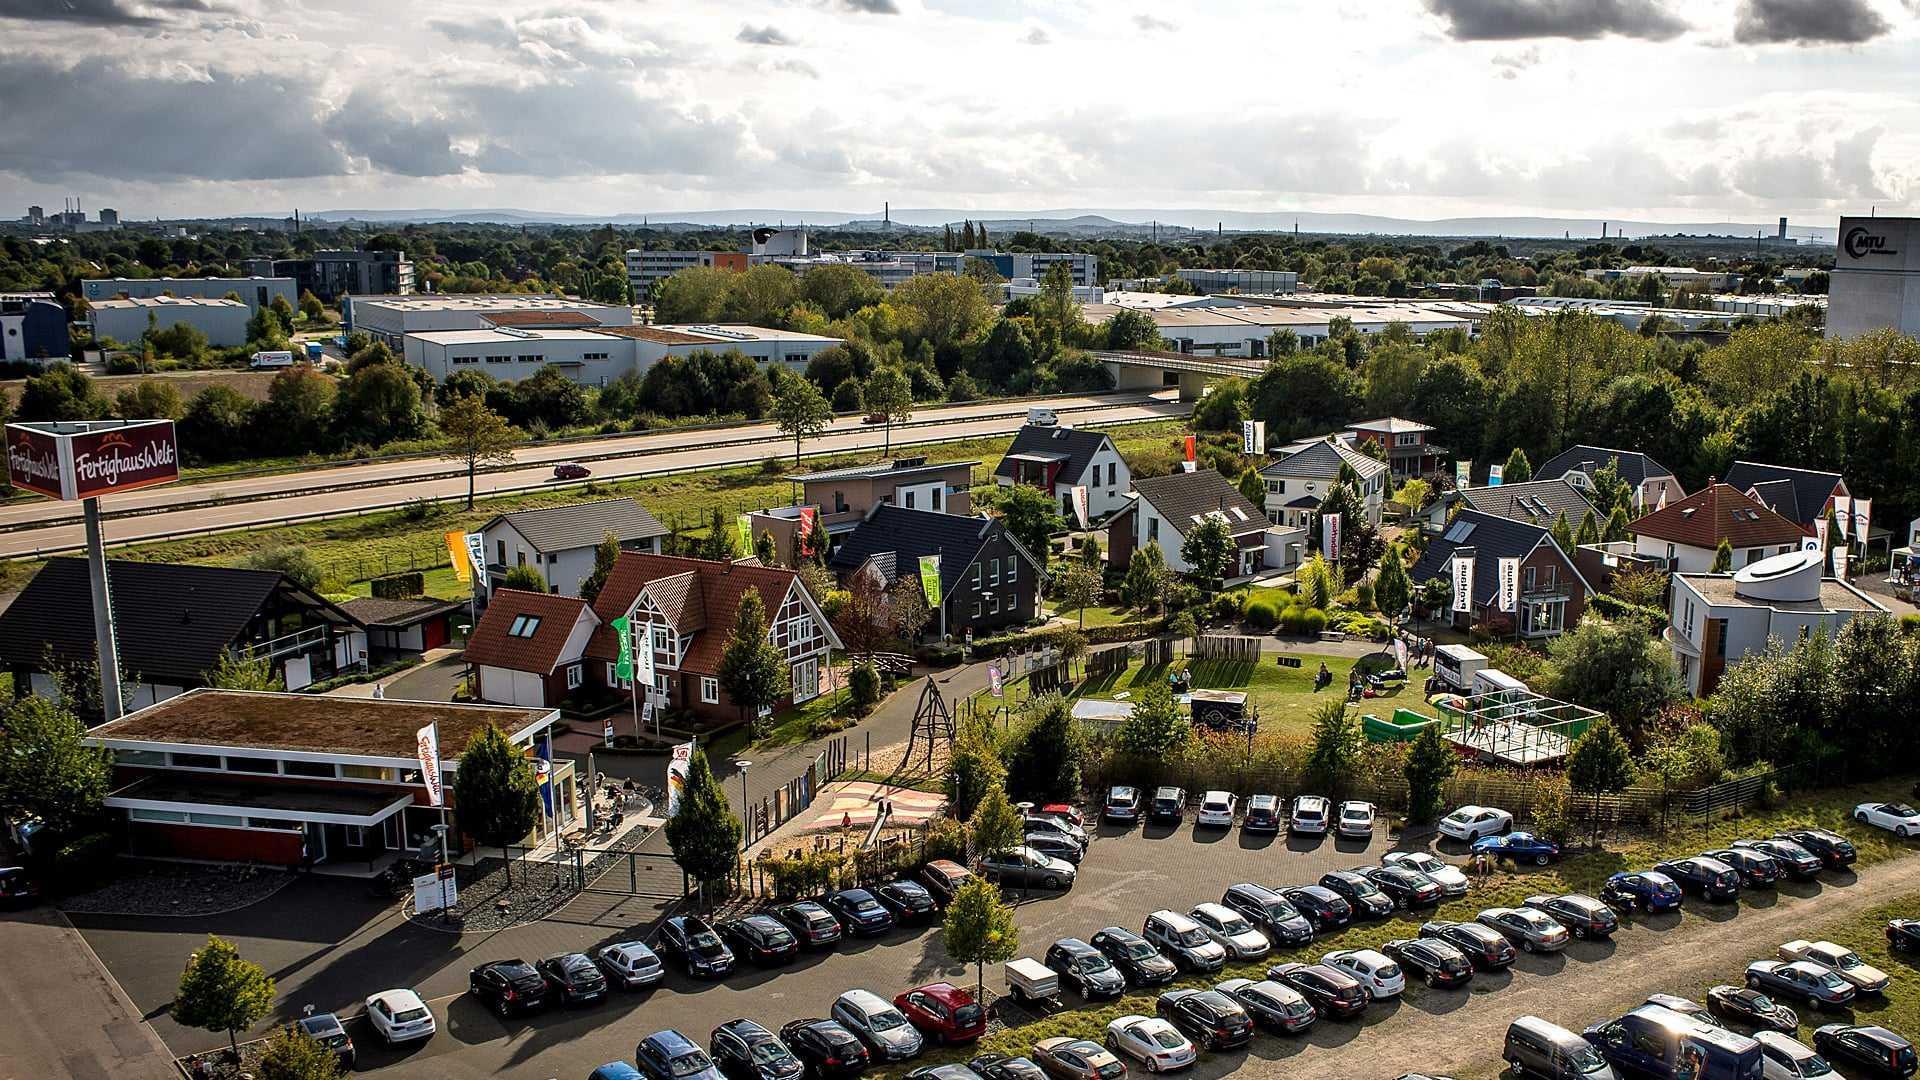 Bauplanung Hannover musterhauspark fertighauswelt am flughafen hannover